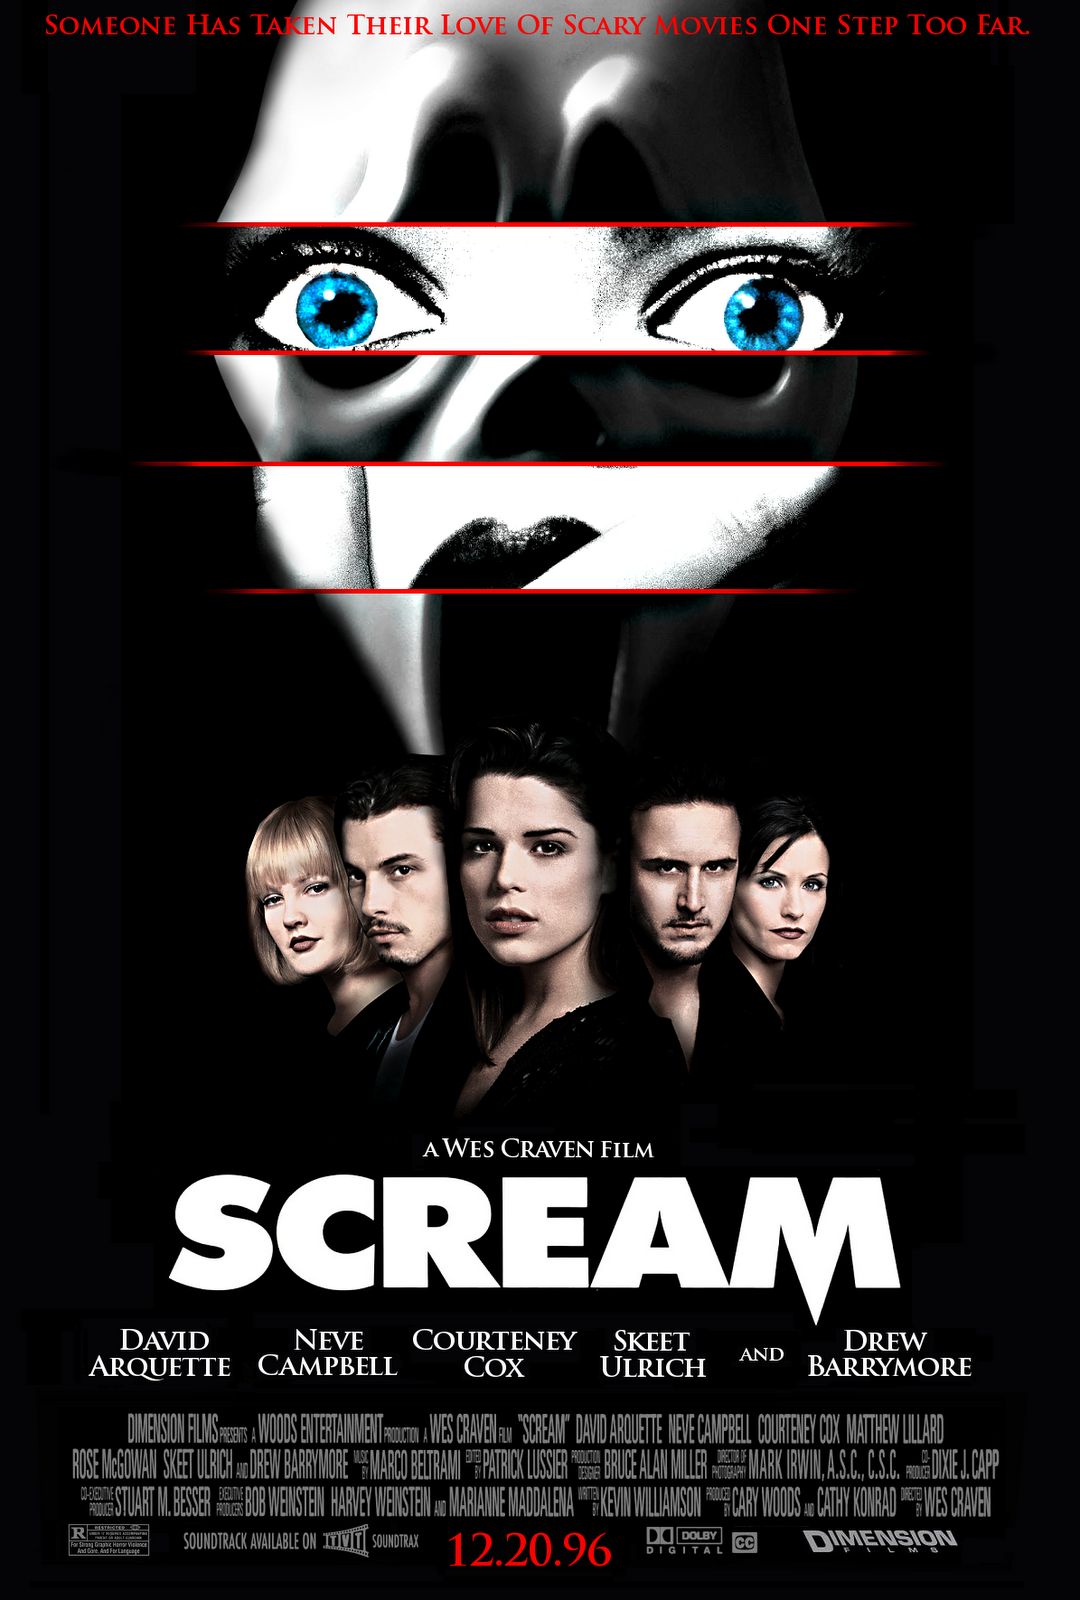 an analysis of the slasher movie scream